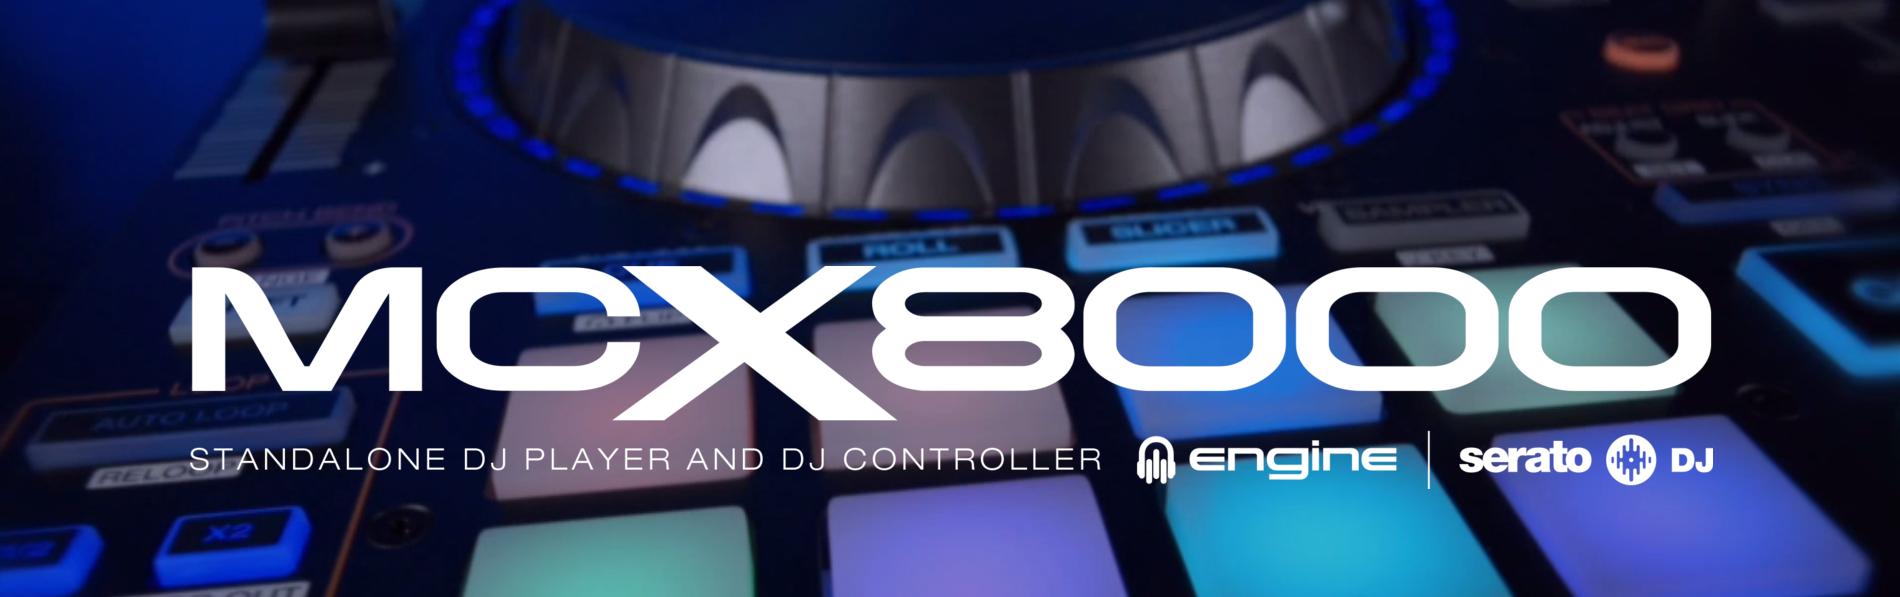 Nuevo Denon MCX8000: Reproductor digital autónomo + Controlador DJ para  Serato - DJMania